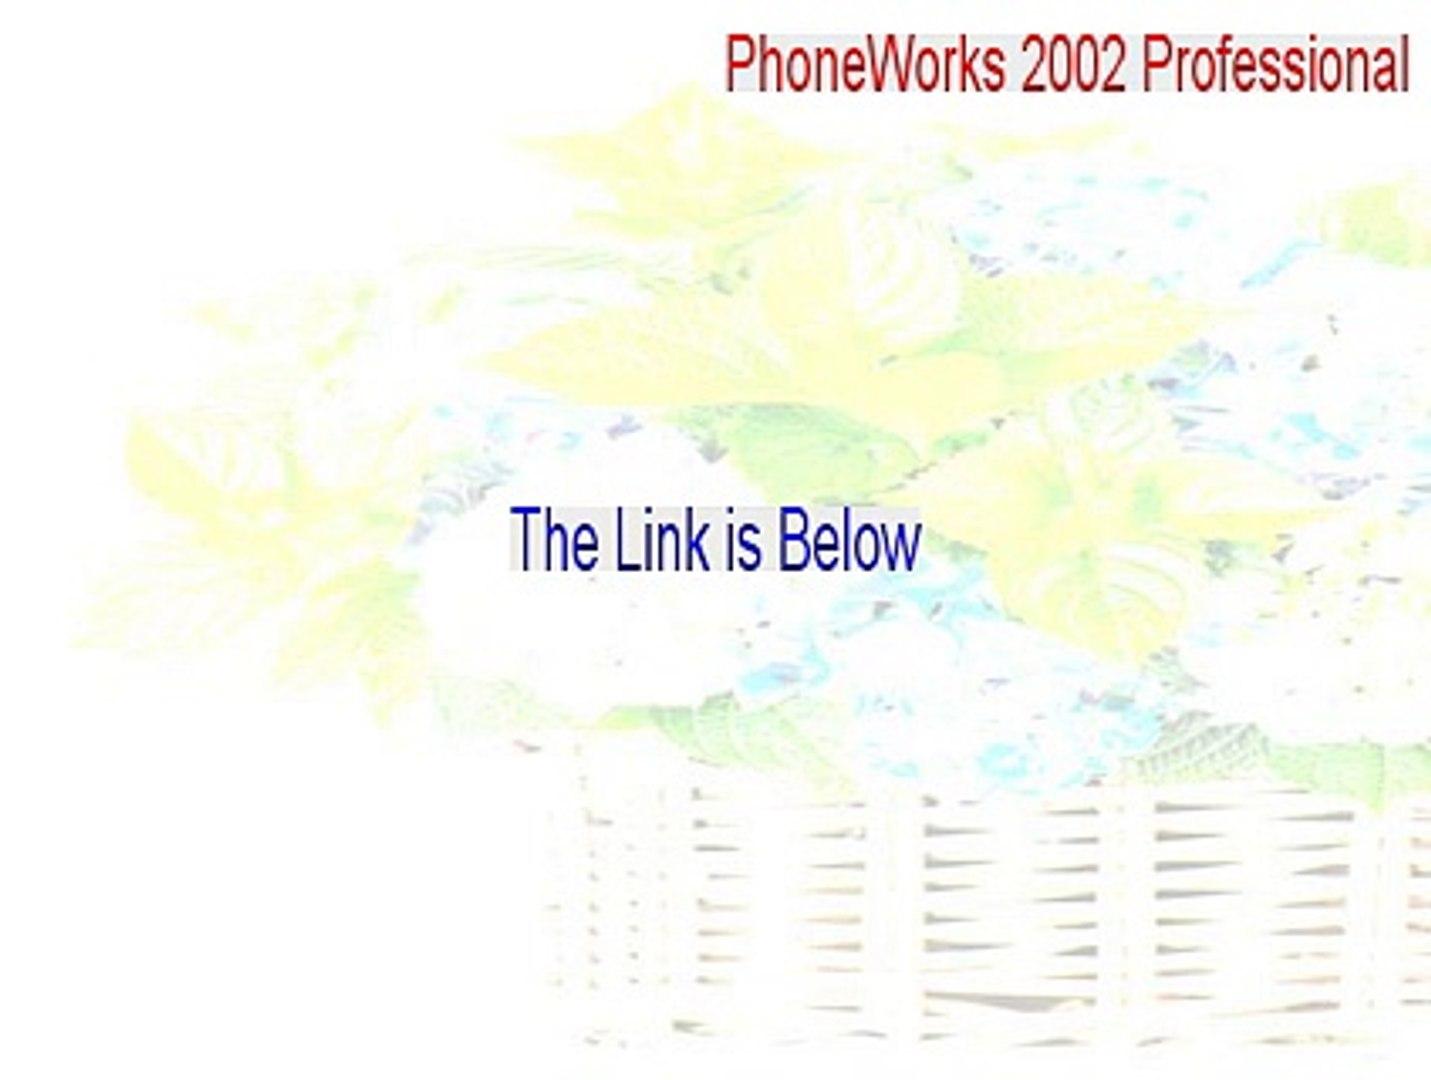 PhoneWorks 2002 Professional Full Download [PhoneWorks 2002 Professionalphoneworks 2002 professional]